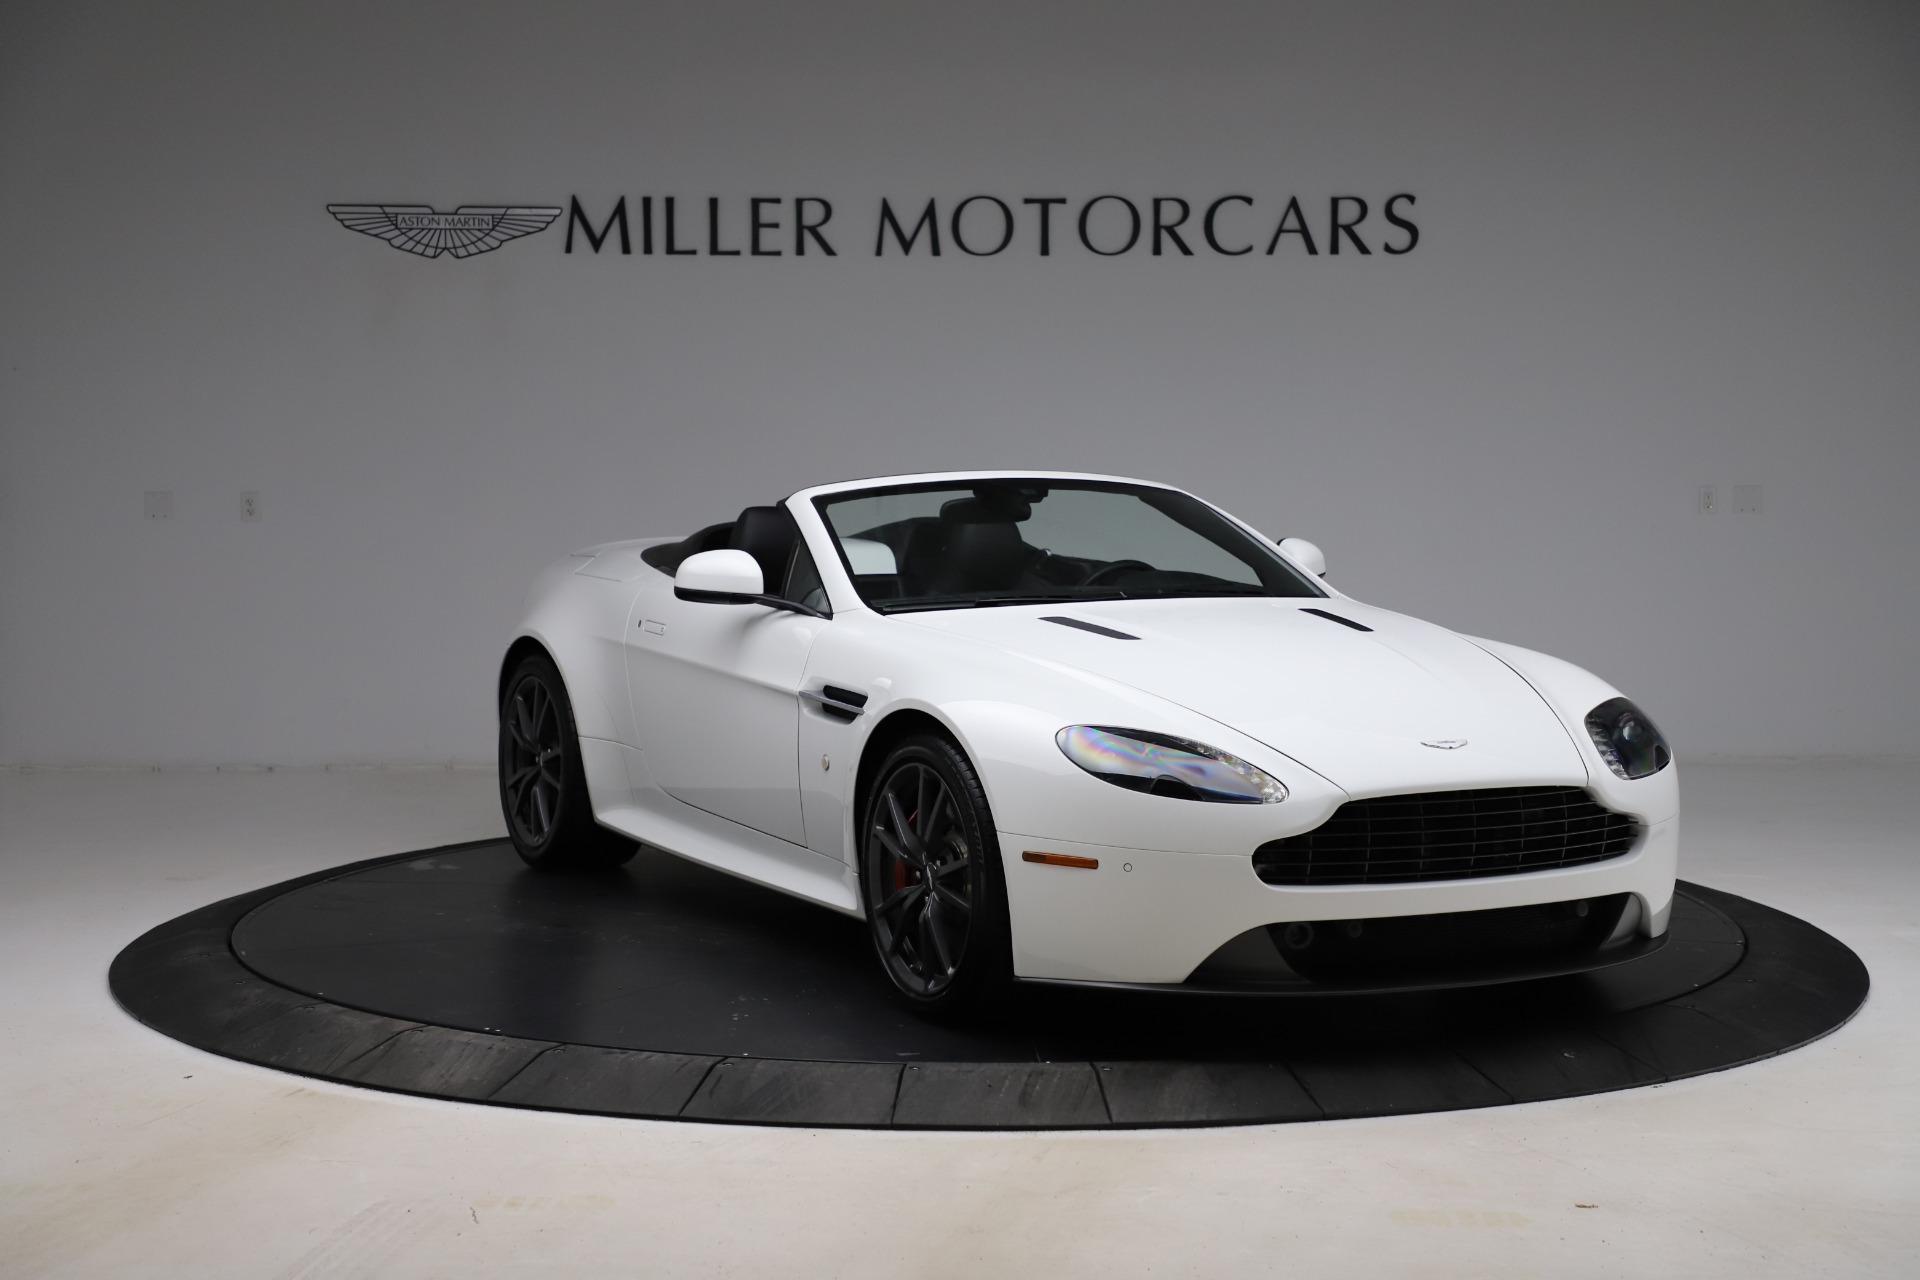 New 2015 Aston Martin Vantage GT GT Roadster